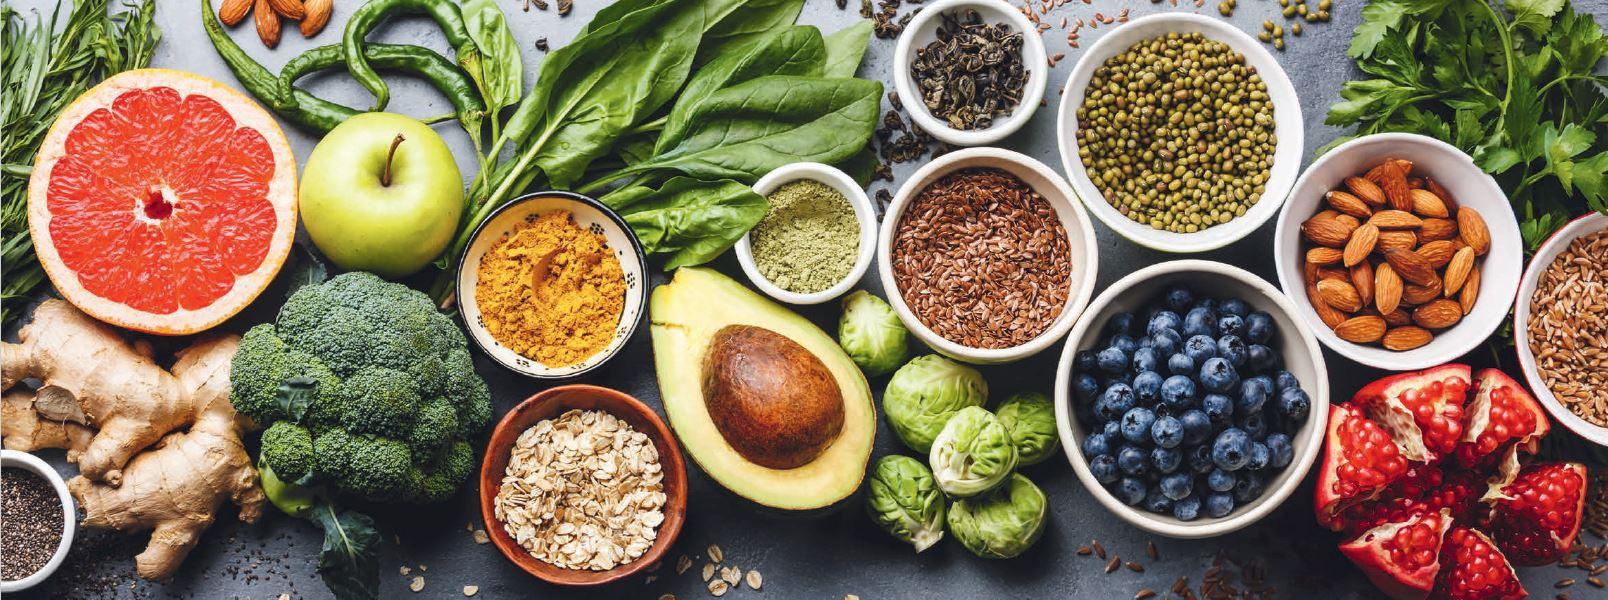 Etude AAGE21 allergies alimentaires